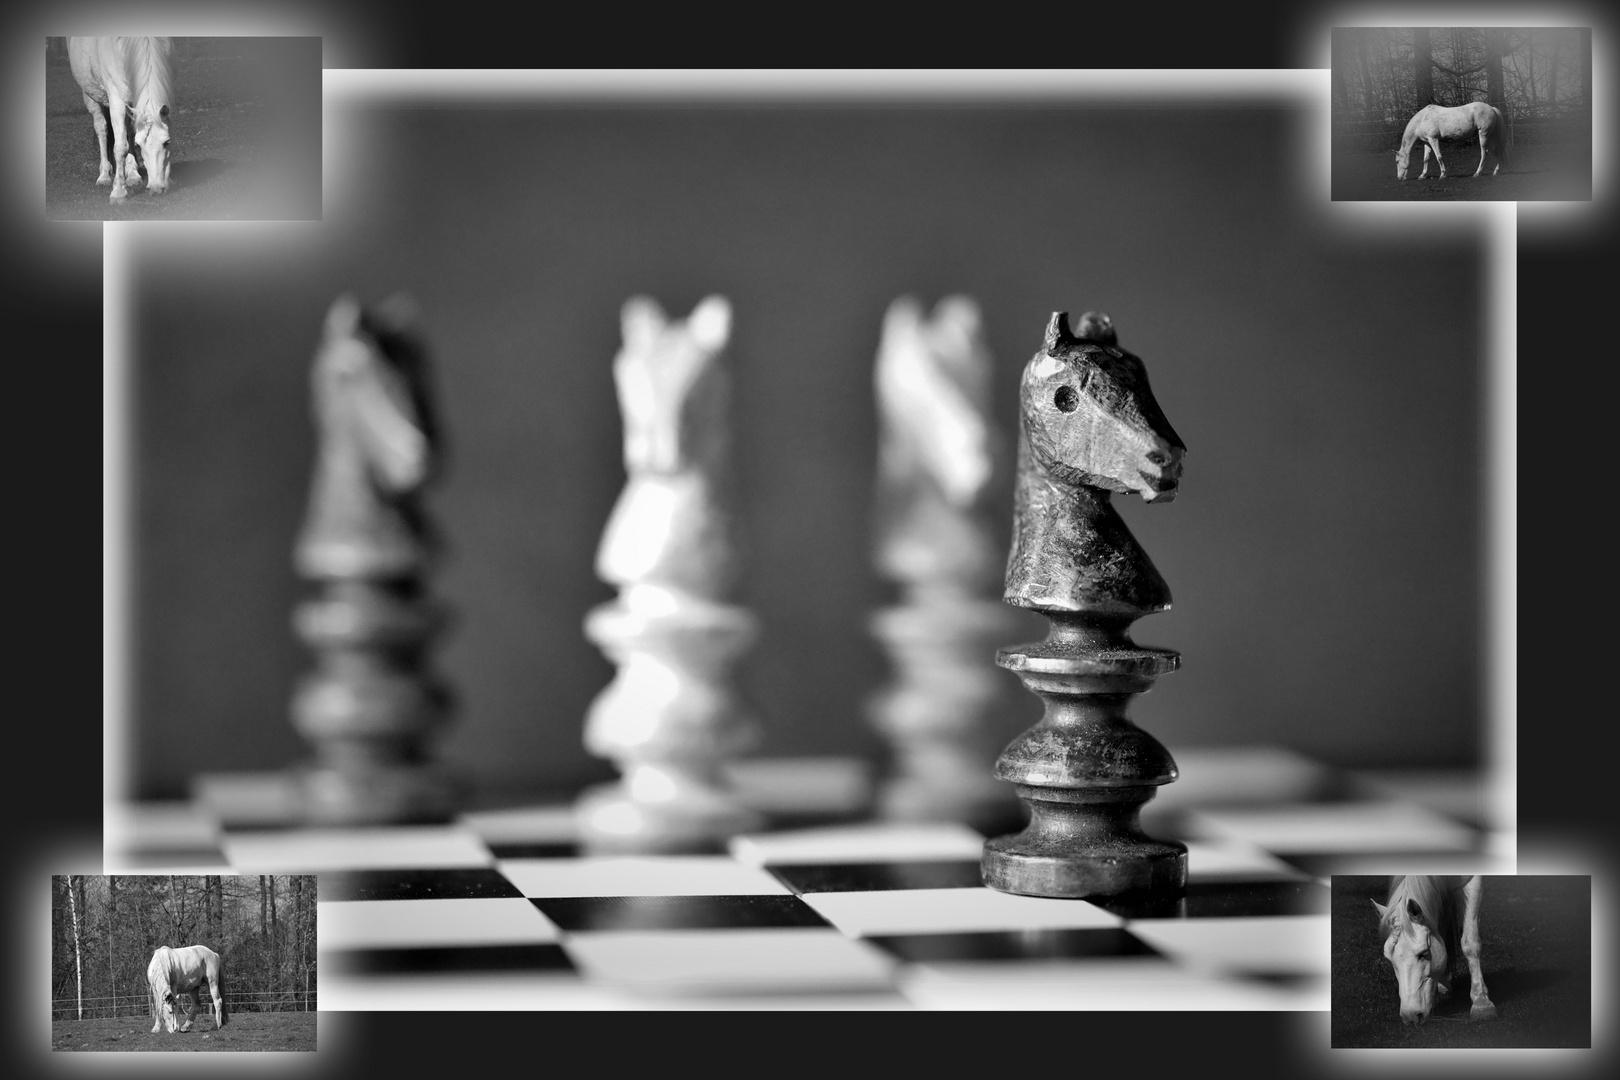 Opas selbst geschnitzte Schachpferde